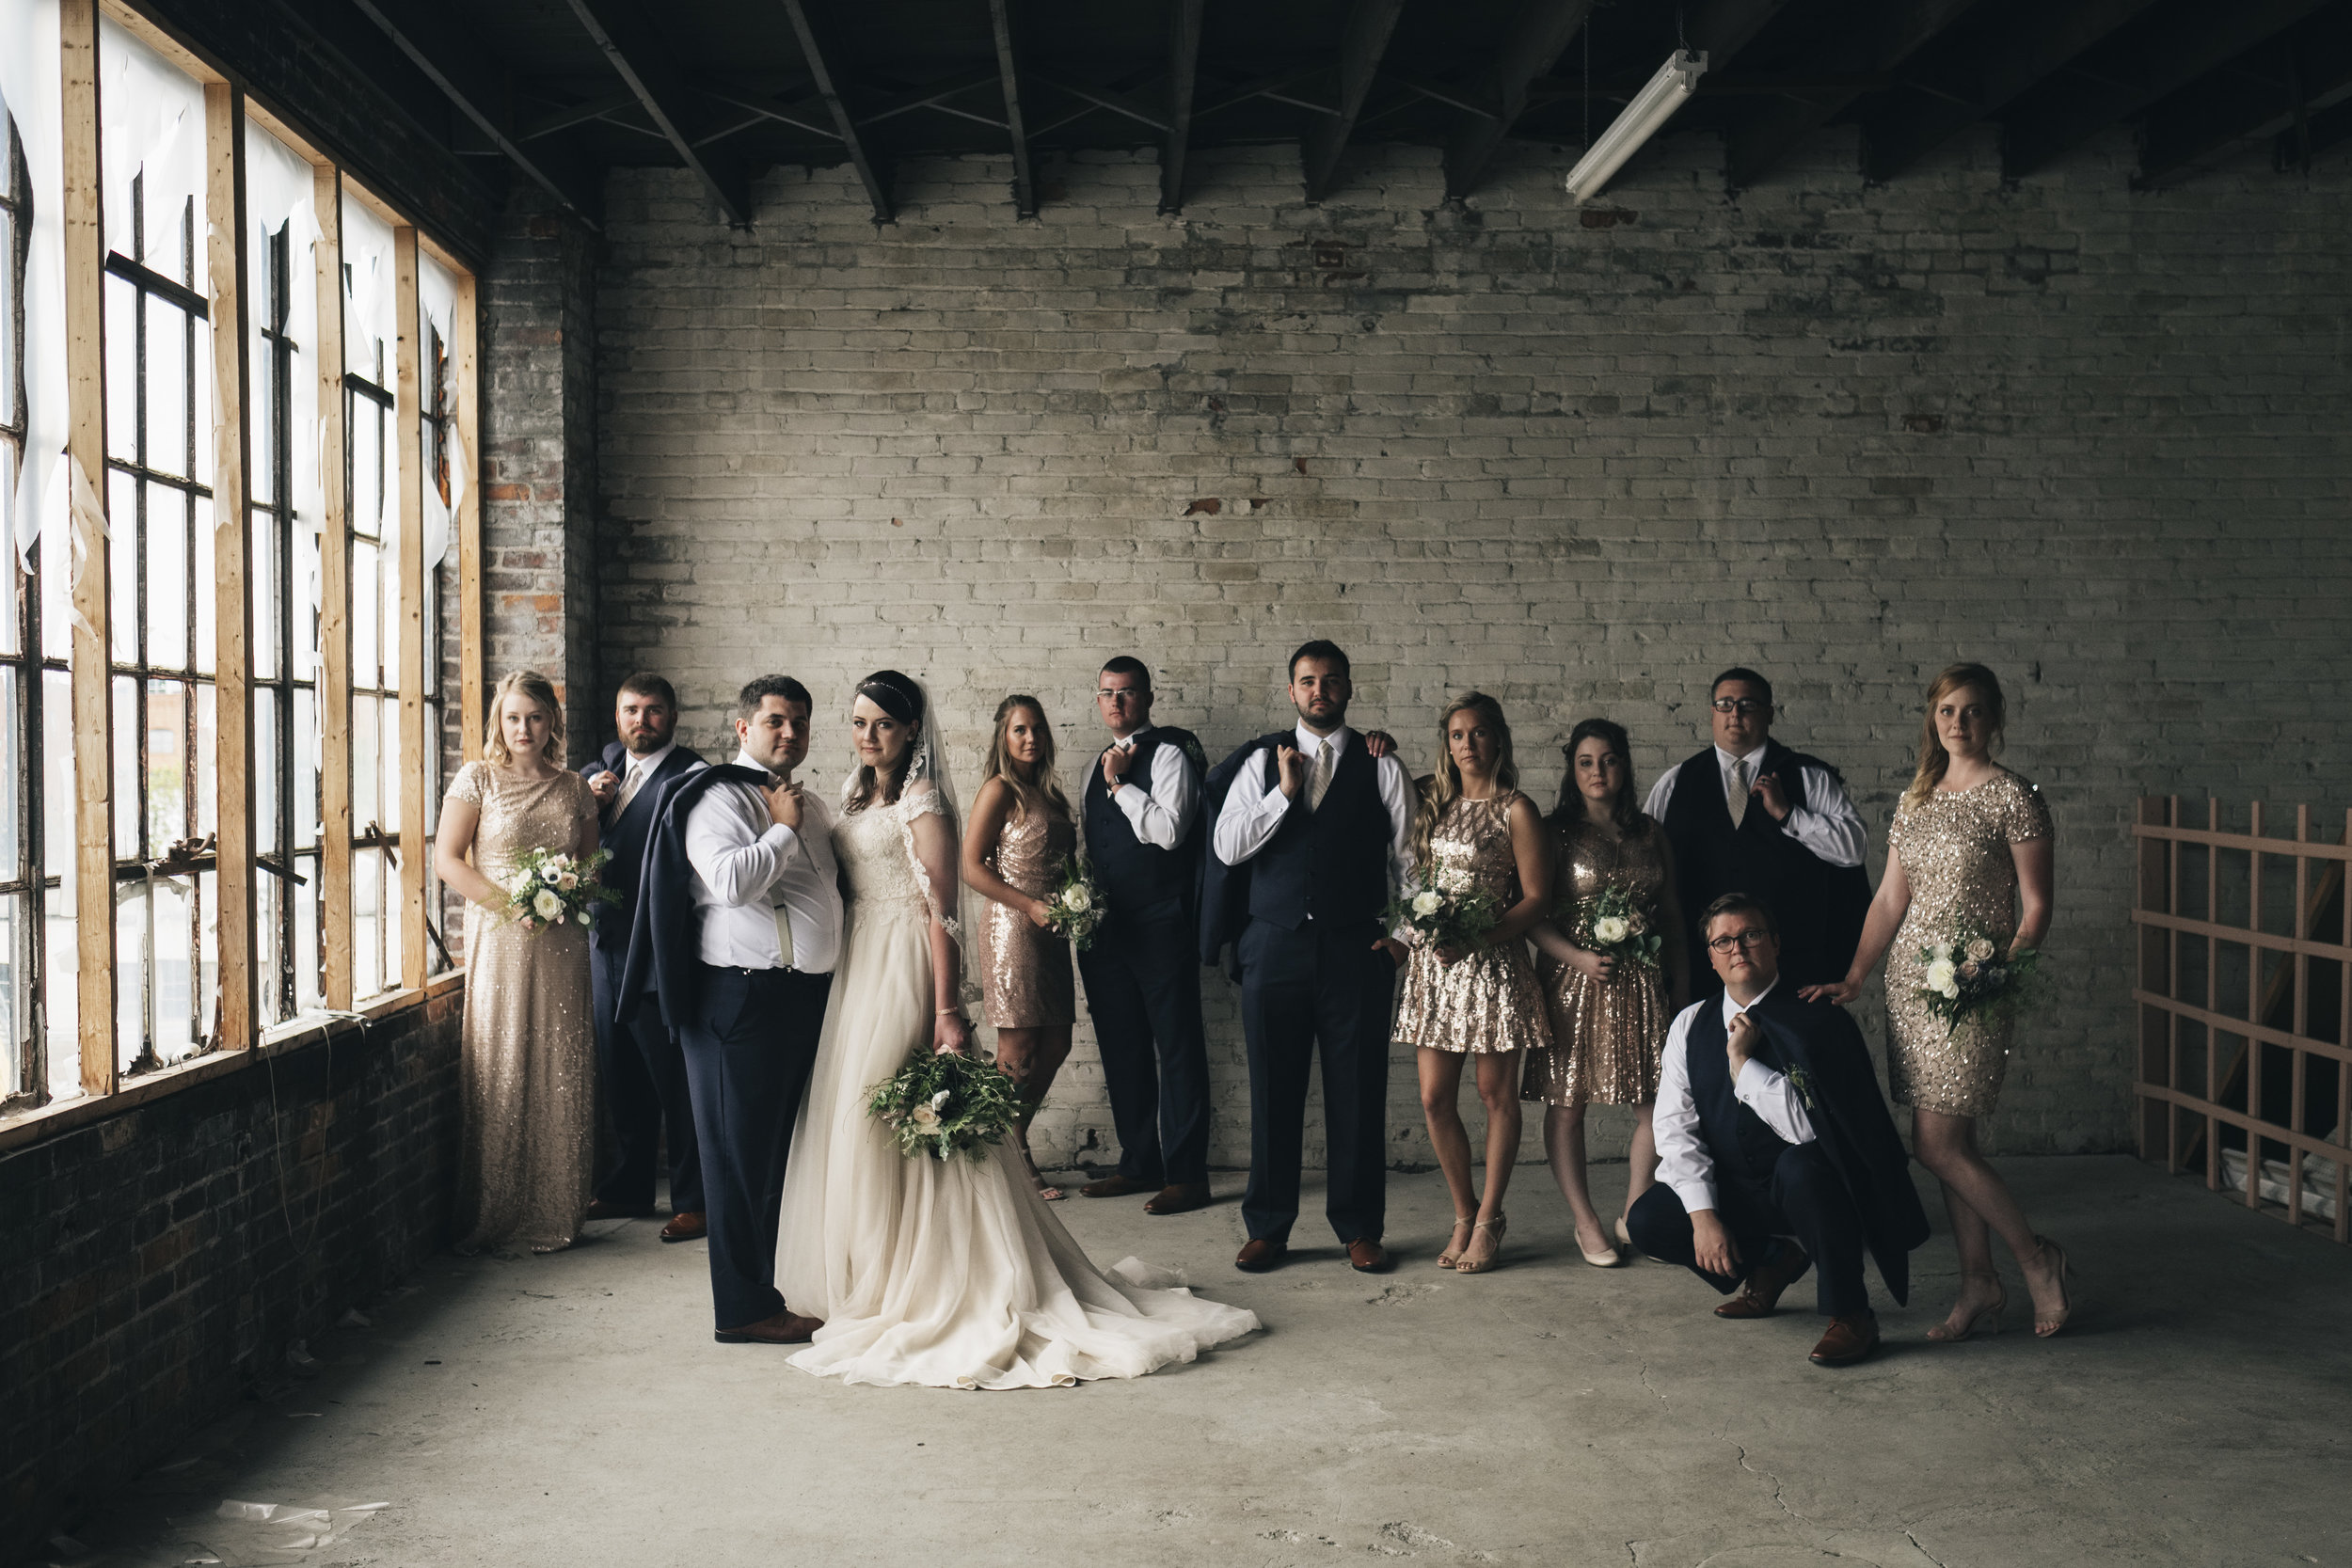 Warehouse_Bridal_Party_in_Toledo_Ohio.jpg